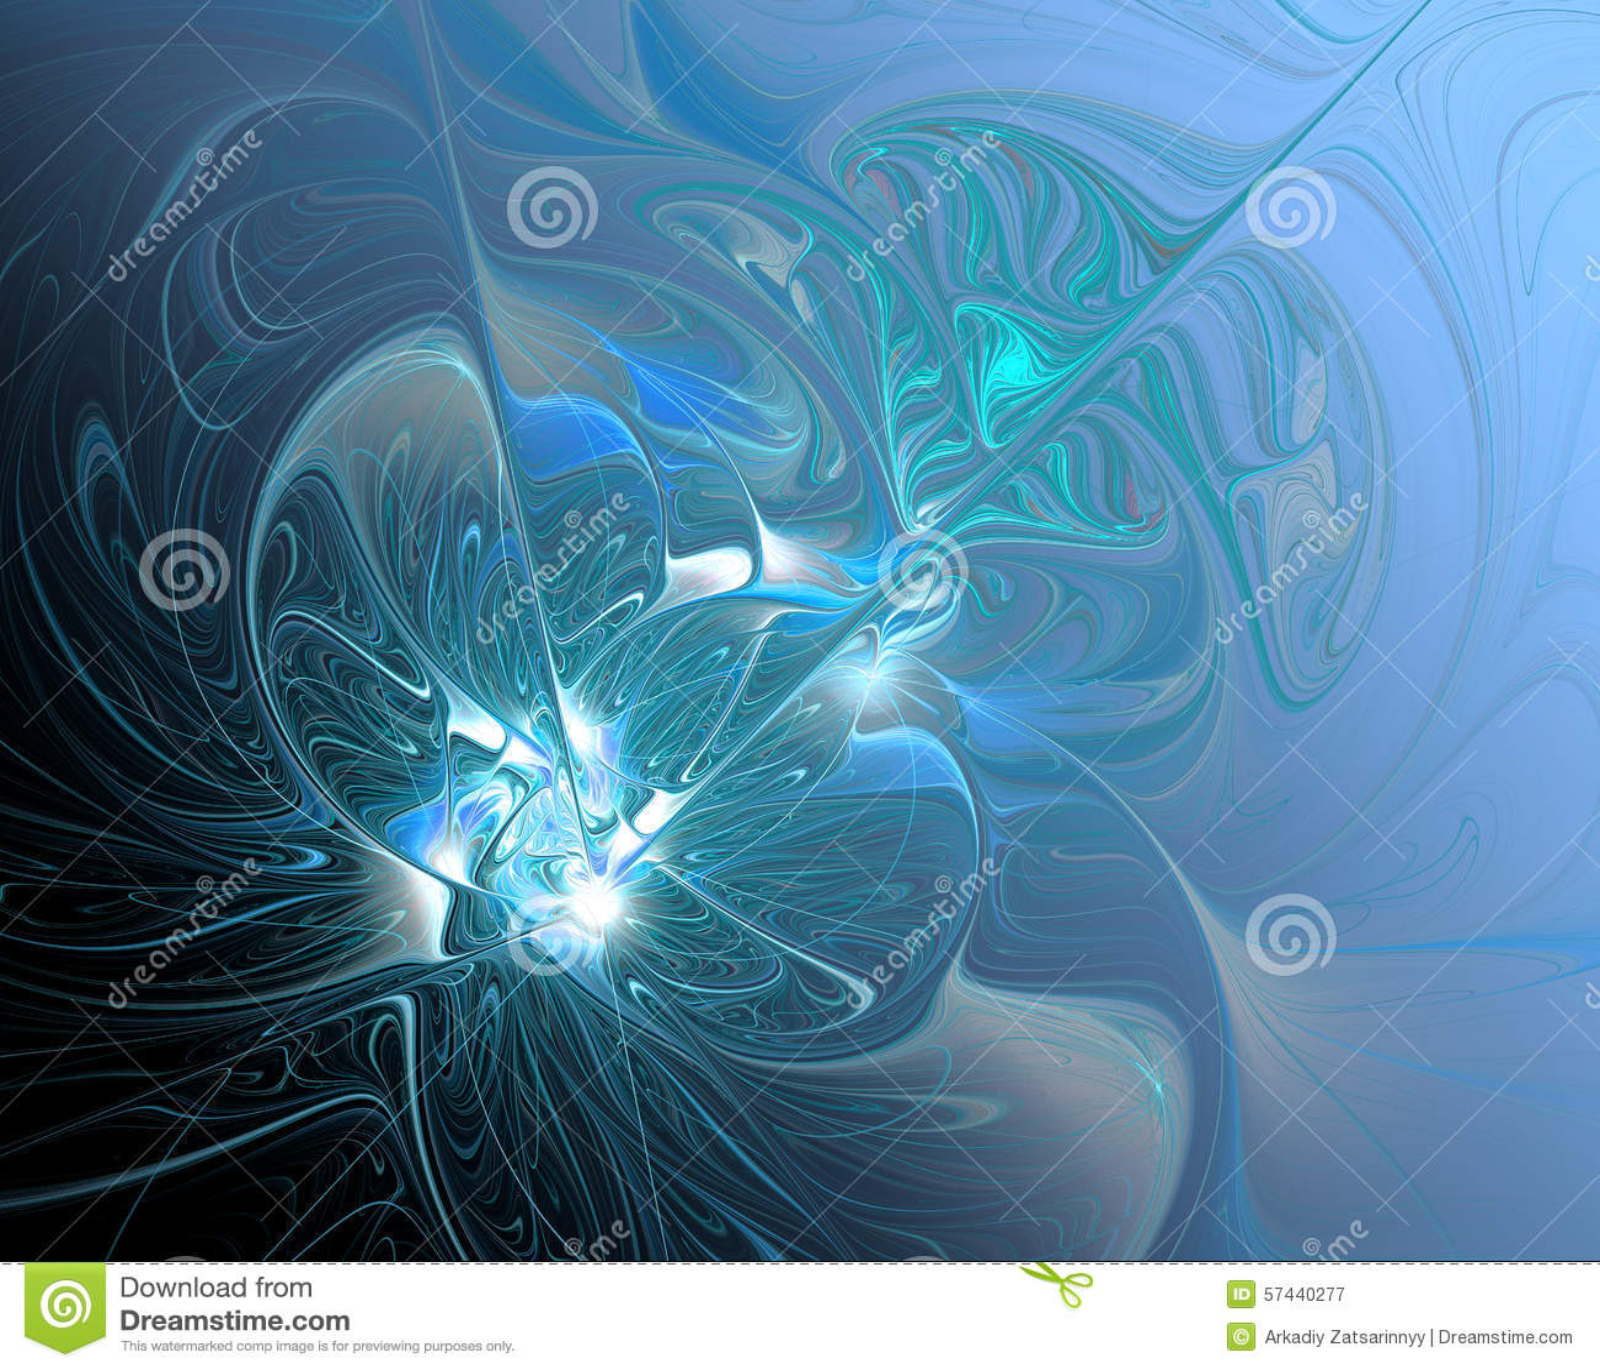 Abstrakte Fractal-Auslegung Turbulenz des schmelzenden Silbers im Blau